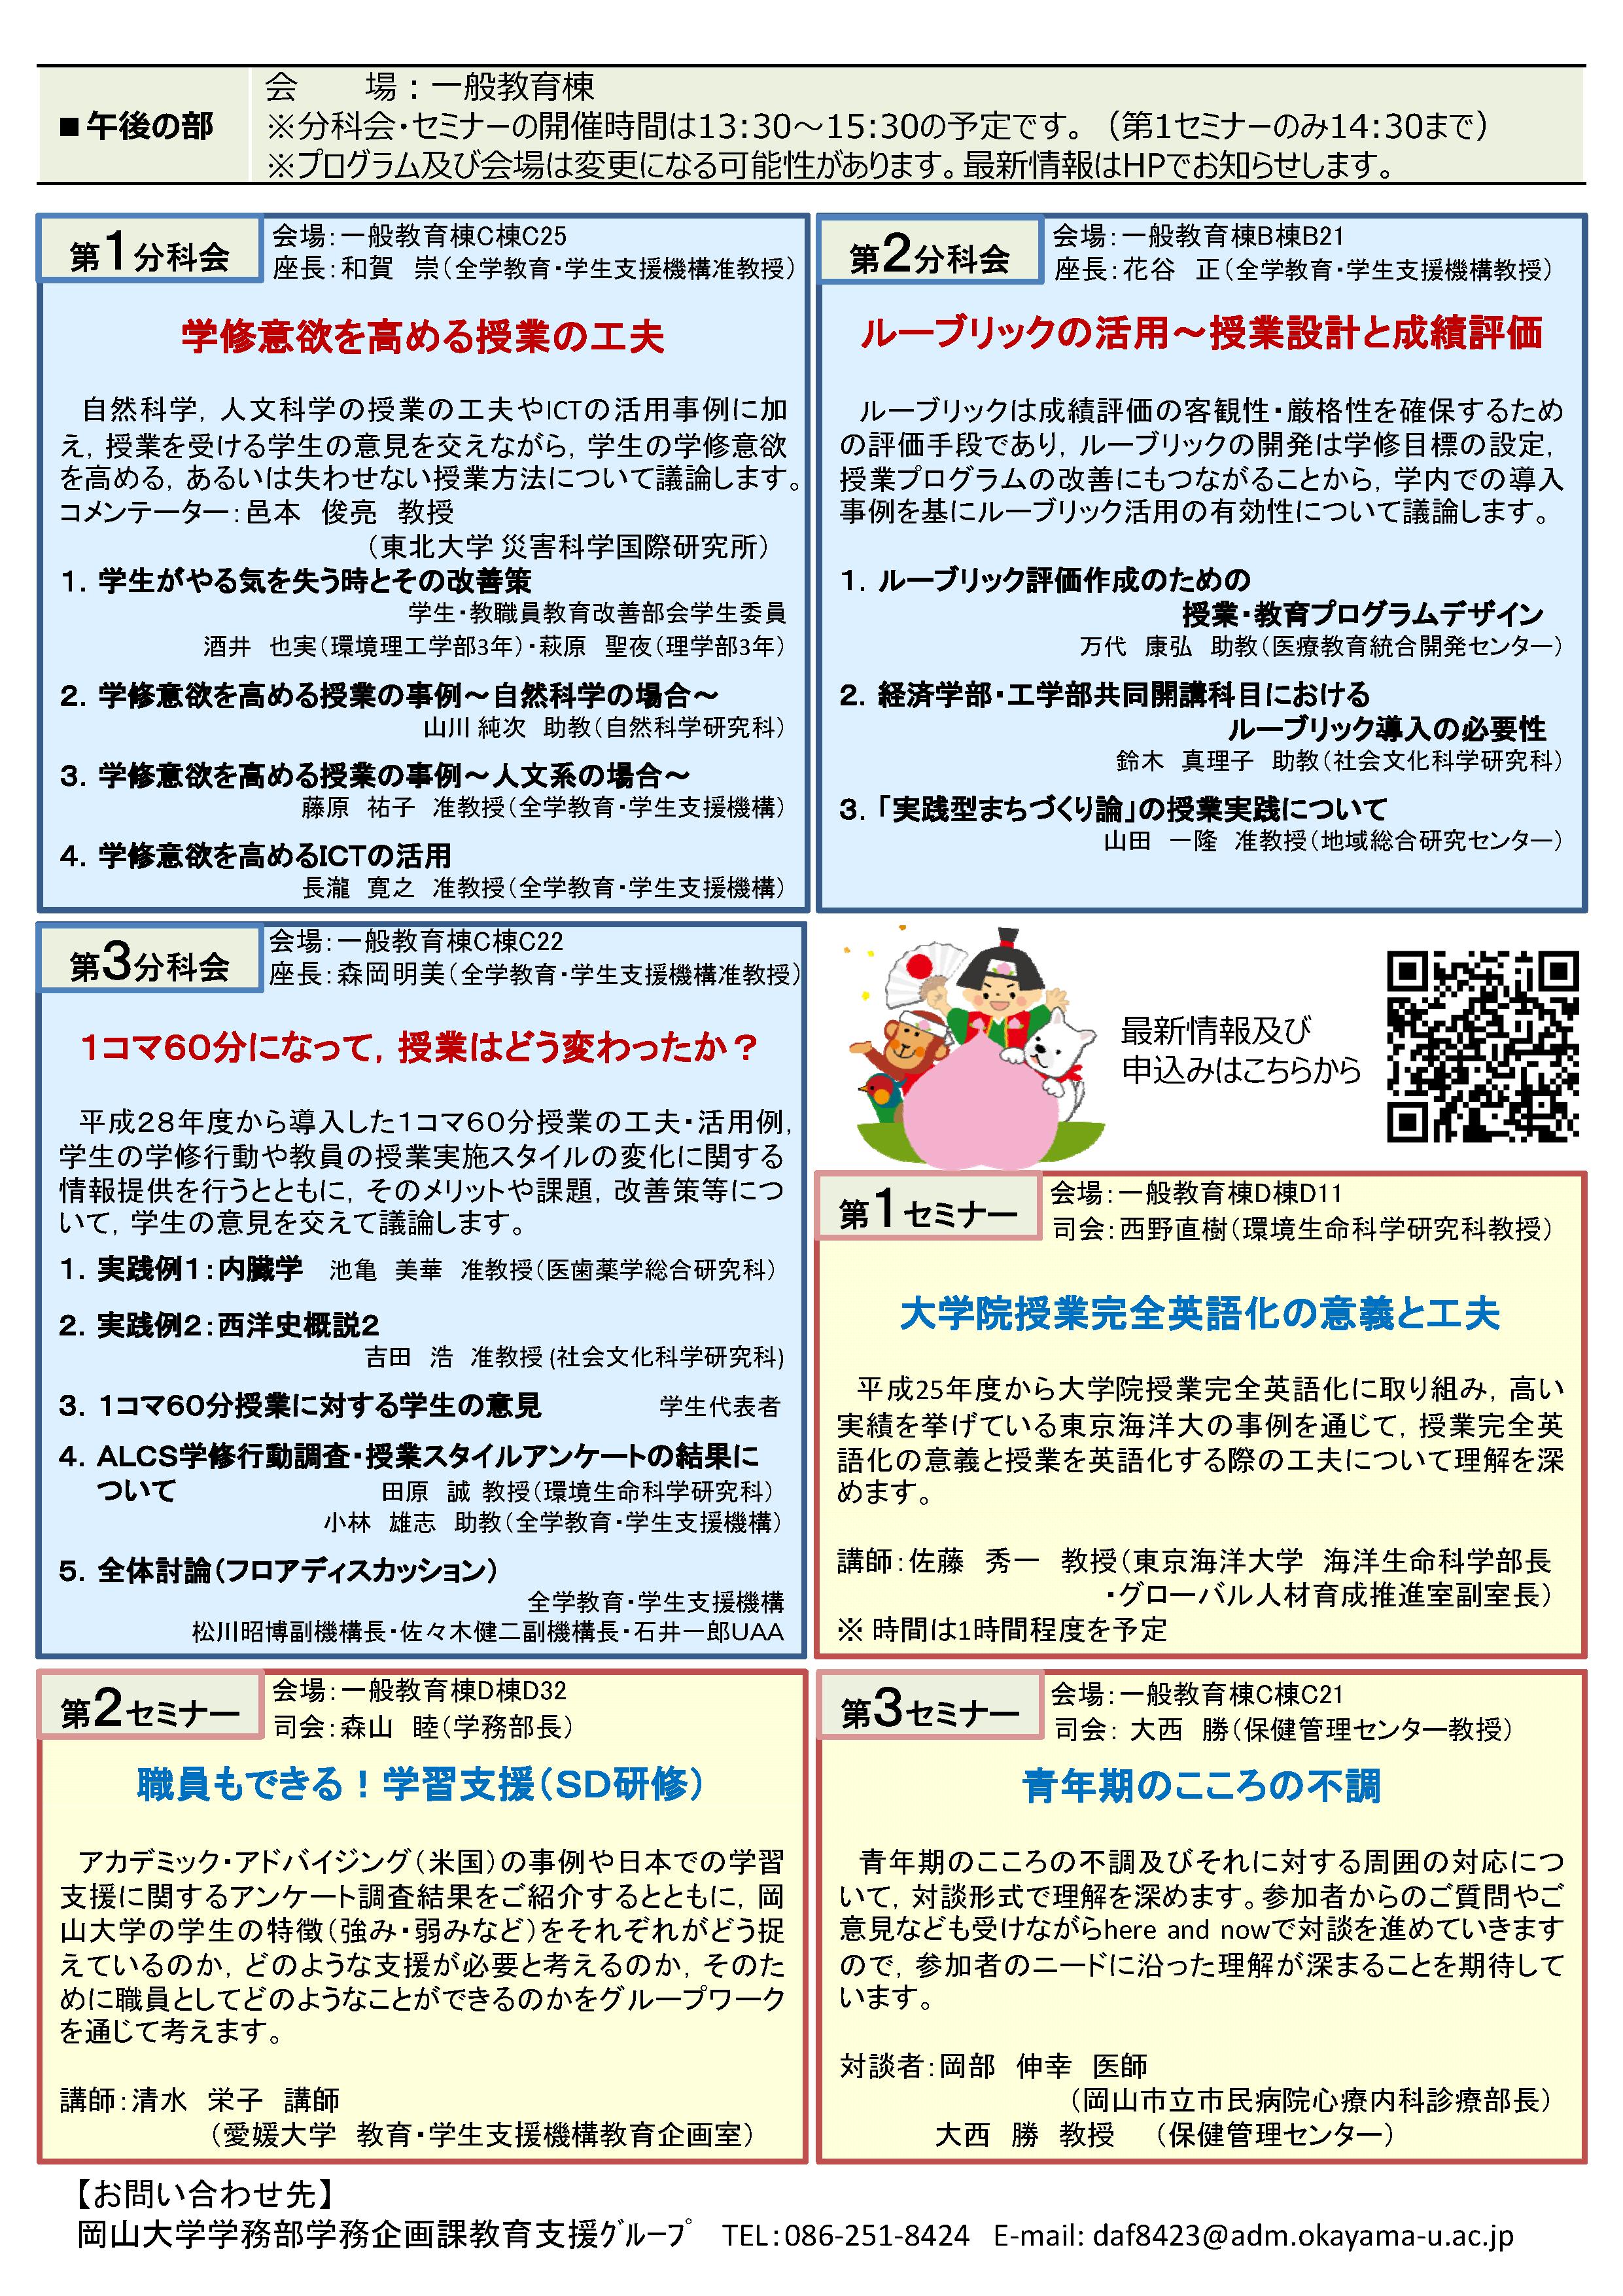 02 H29教職員研修第20回桃太郎フォーラムプログラム_ページ_2.png